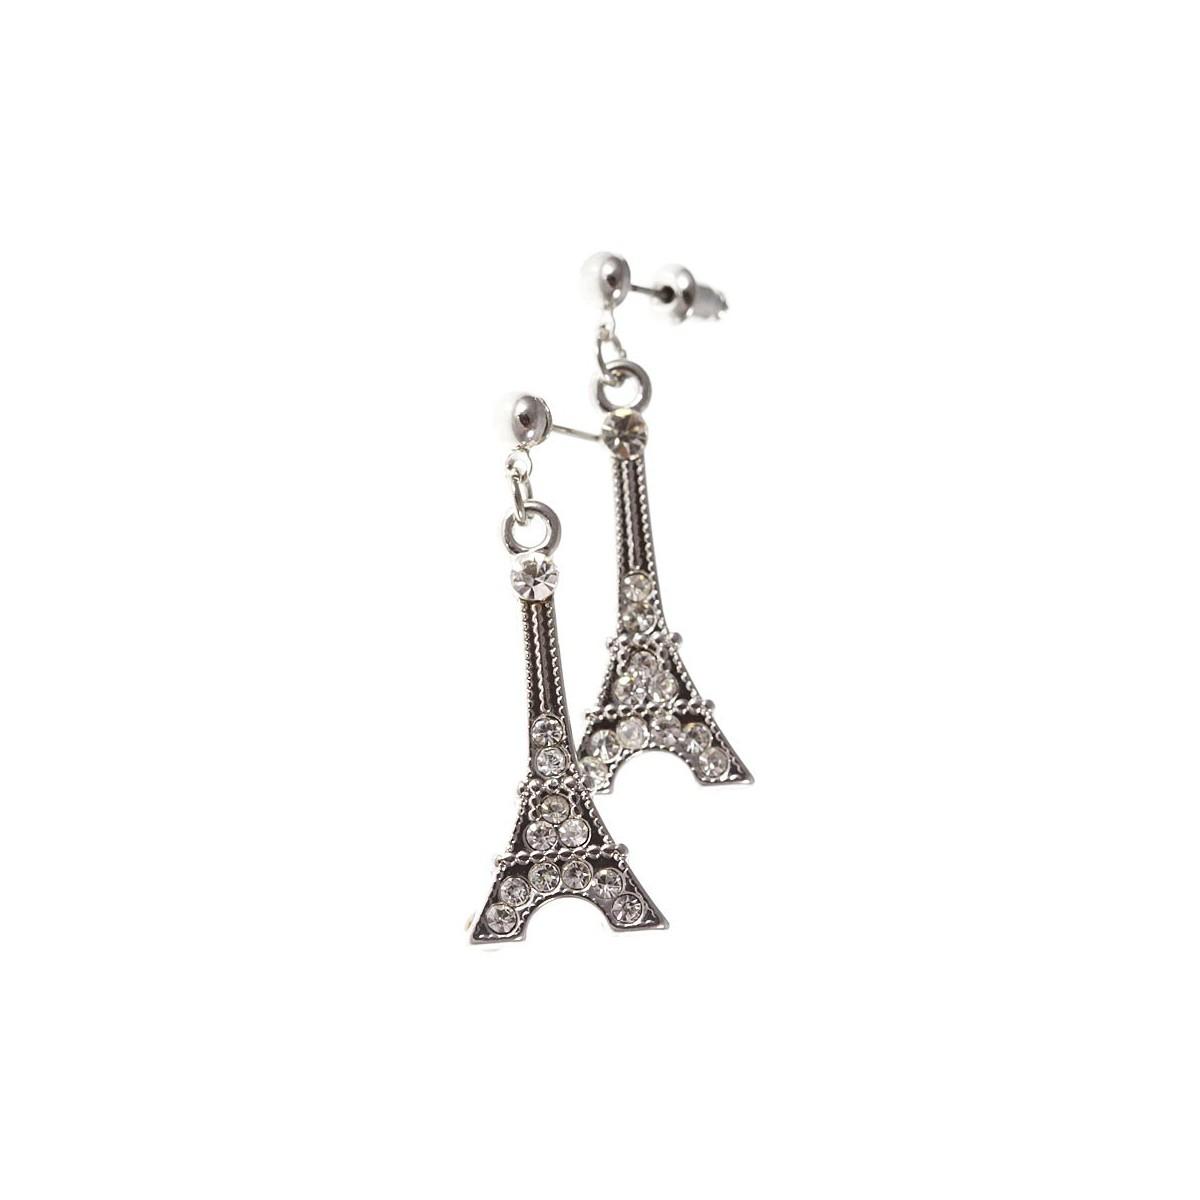 Boucles d'oreilles Tour Eiffel strass